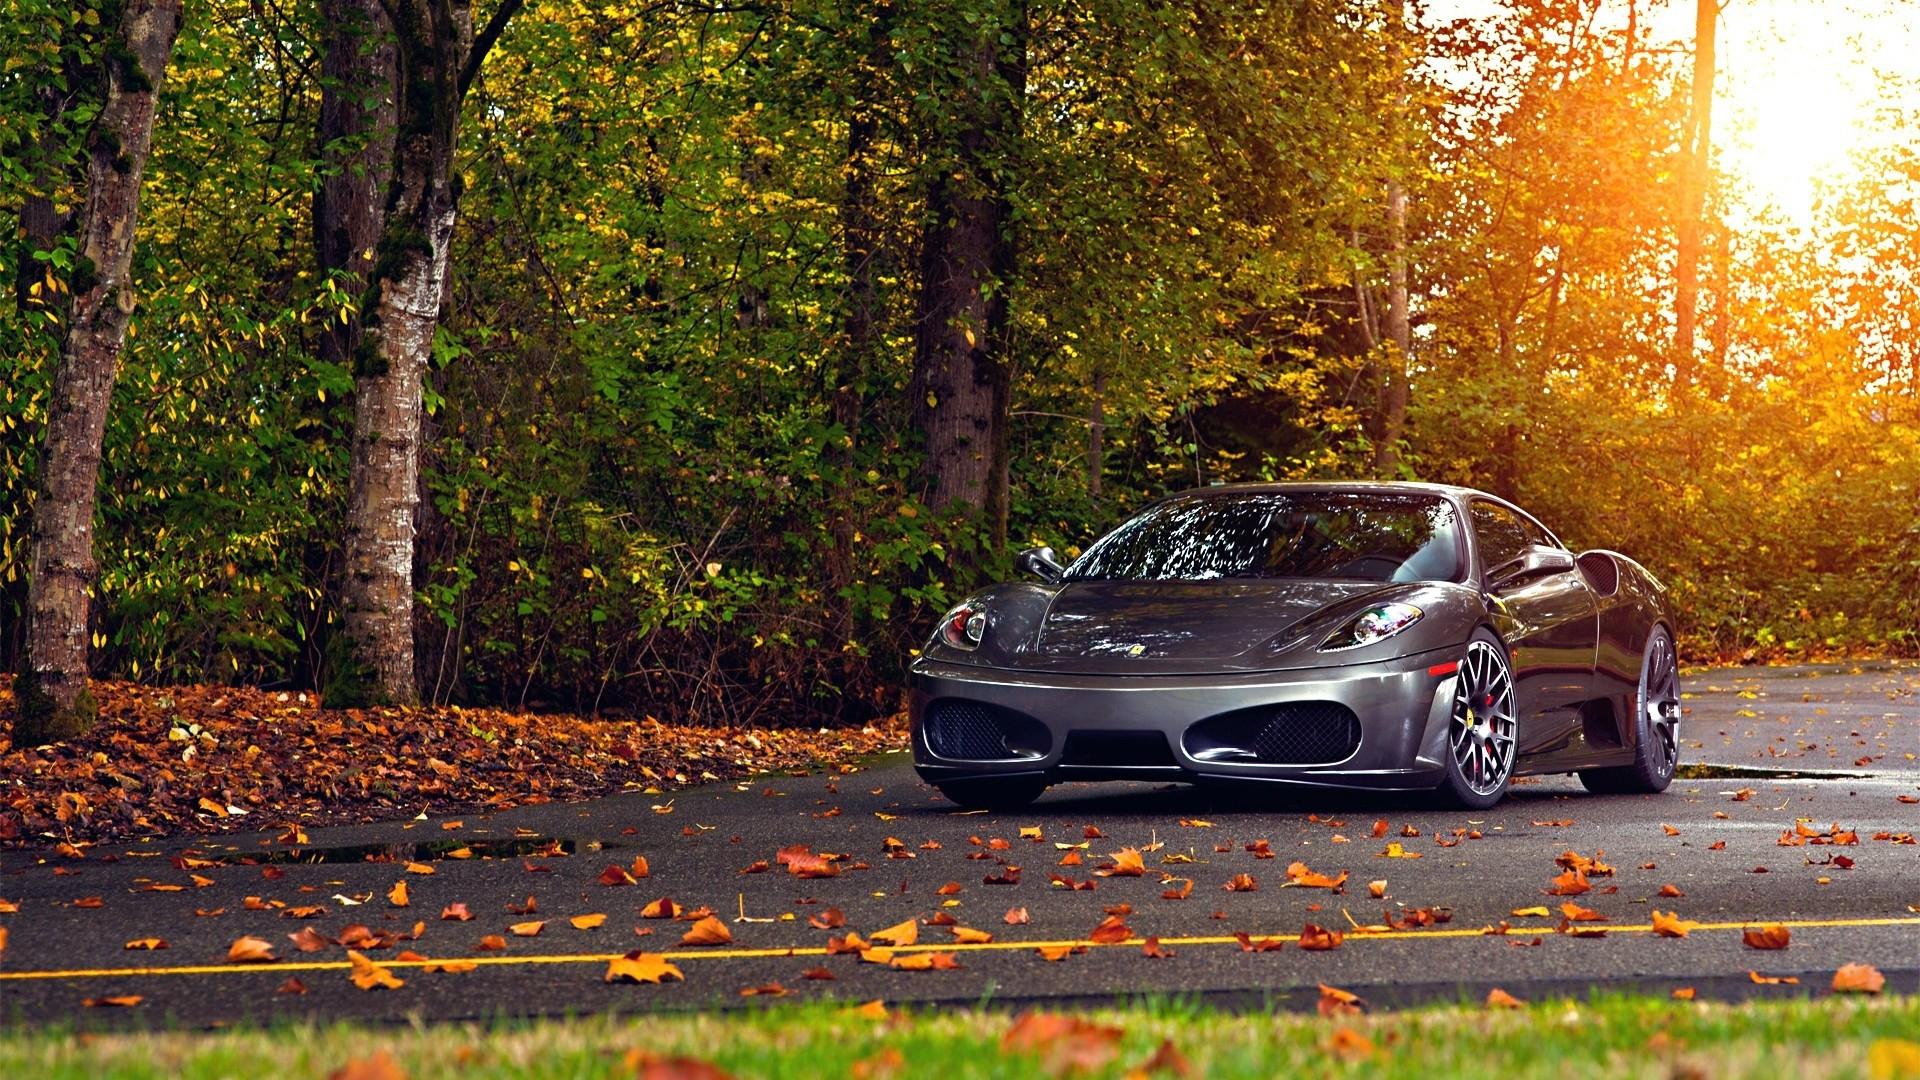 scuderia sports car autumn luxury, Desktop Backgrounds HD 1080p .